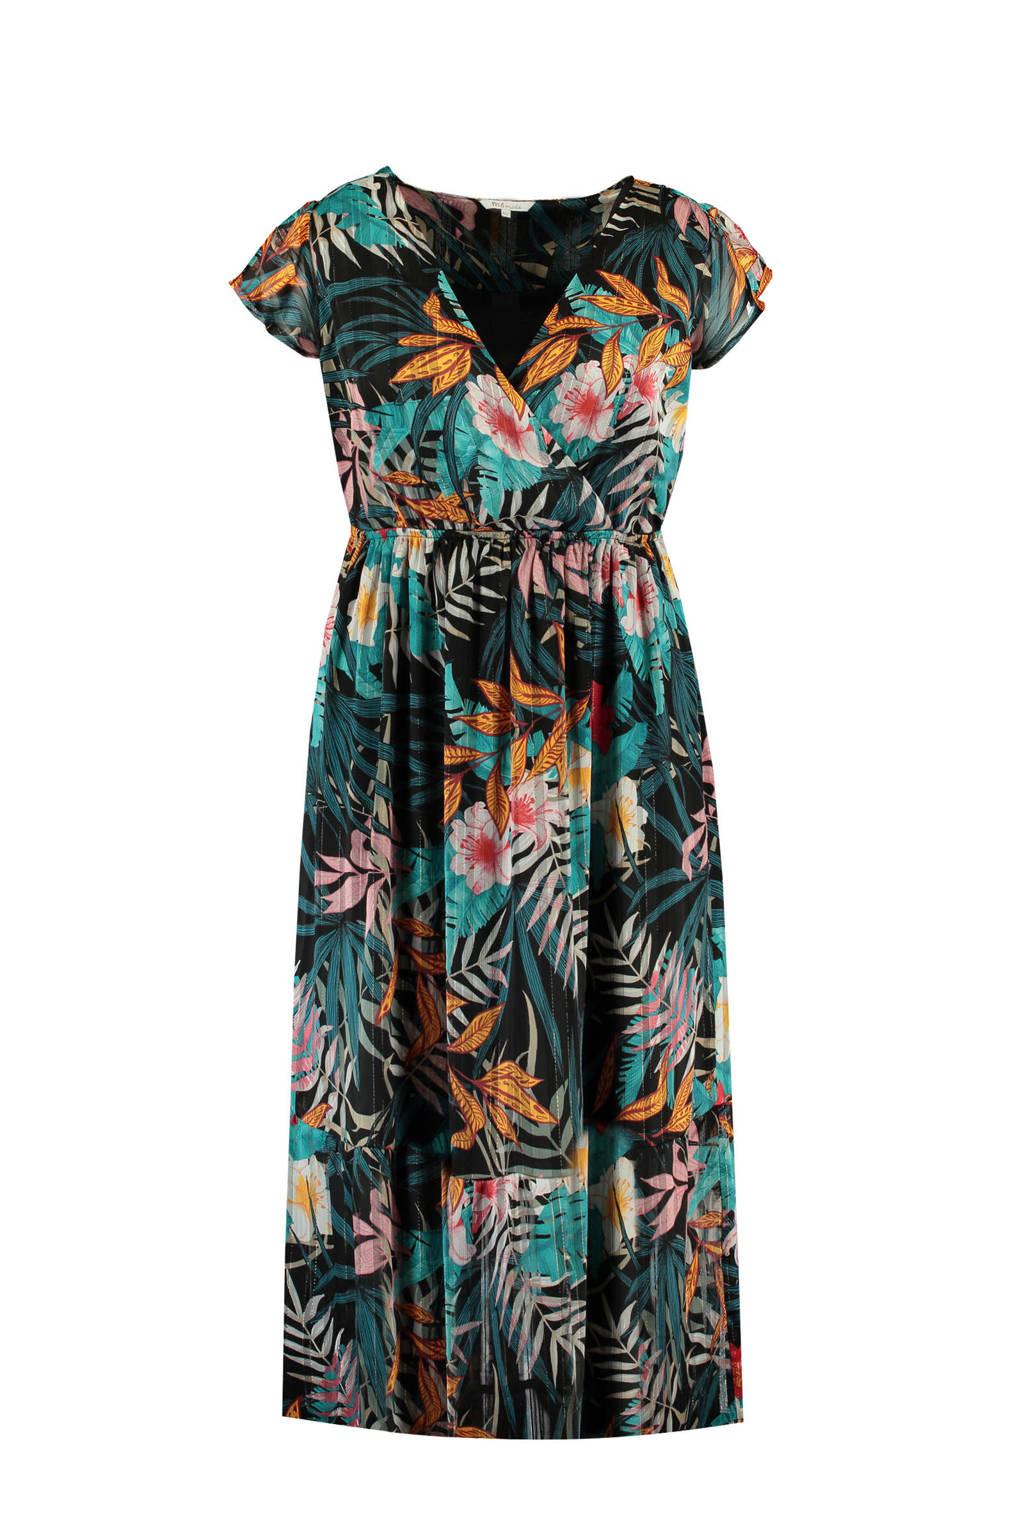 MS Mode gebloemde A-lijn jurk blauw, Multi